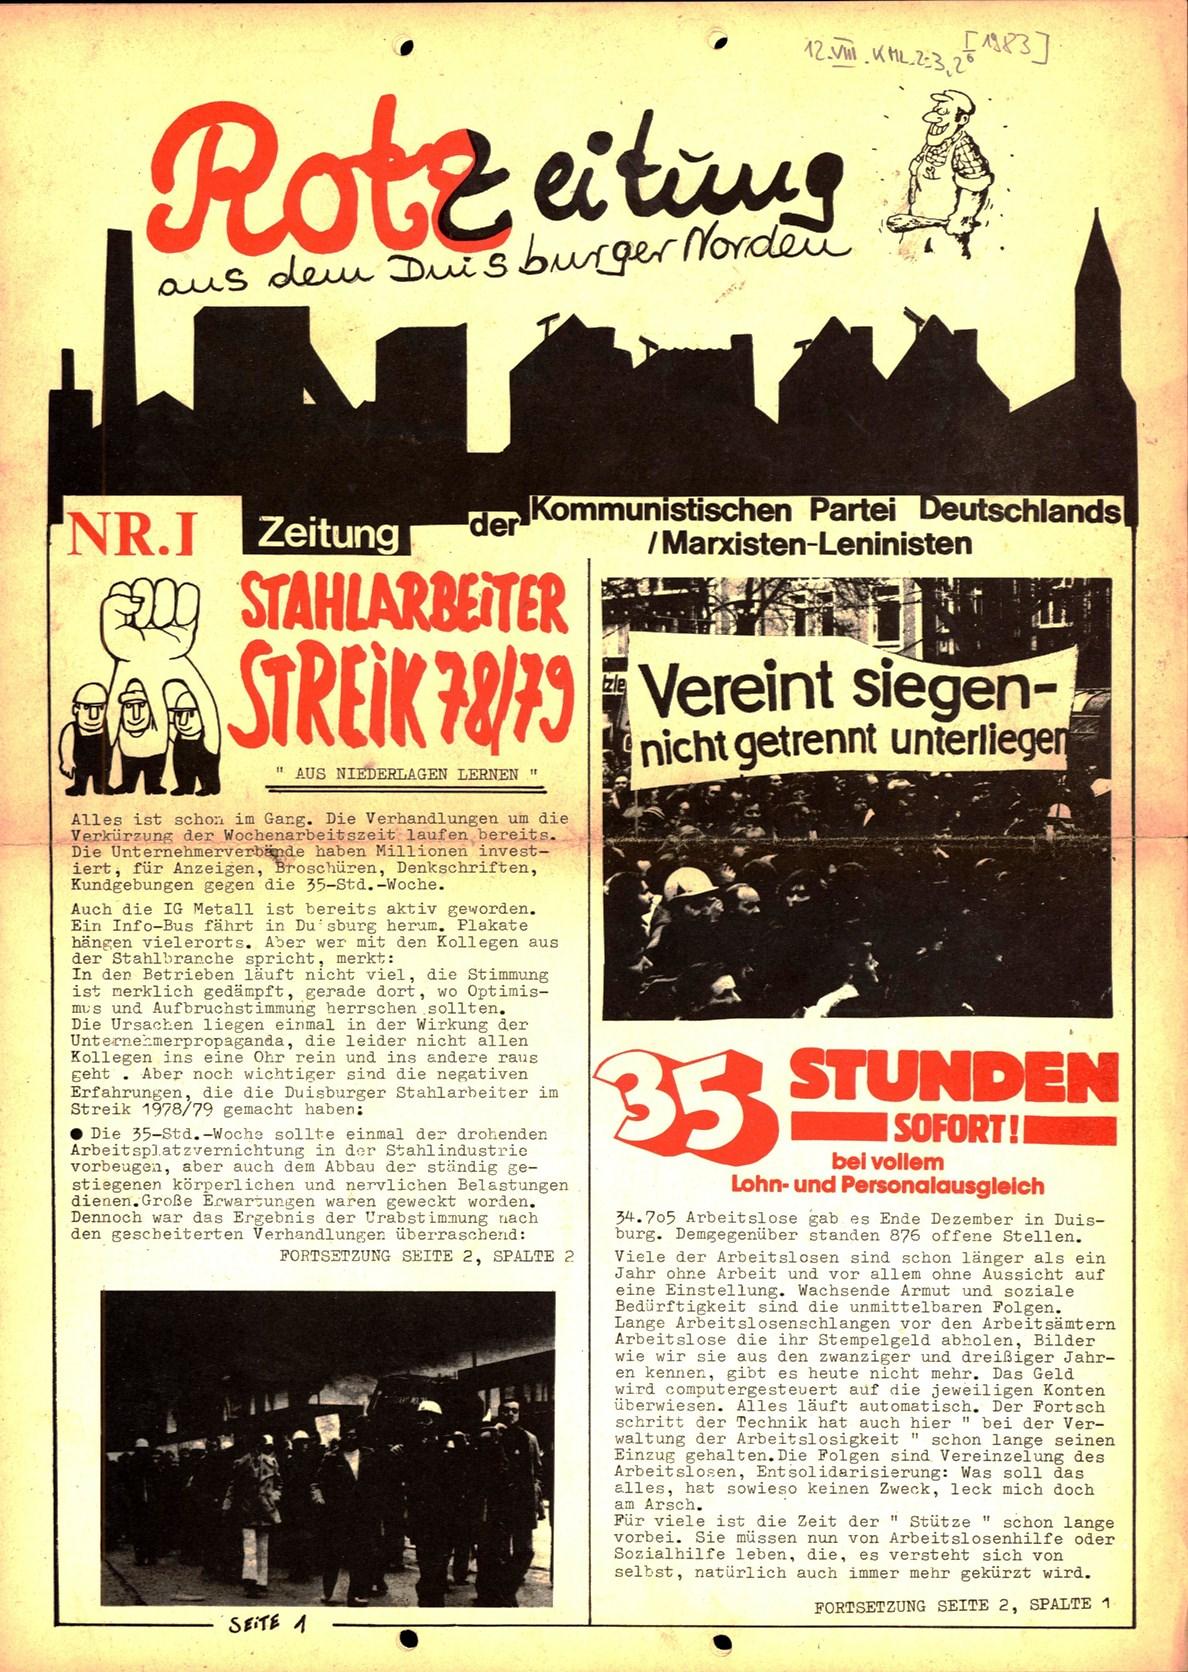 Duisburg_KPDML_Rote_Zeitung_01